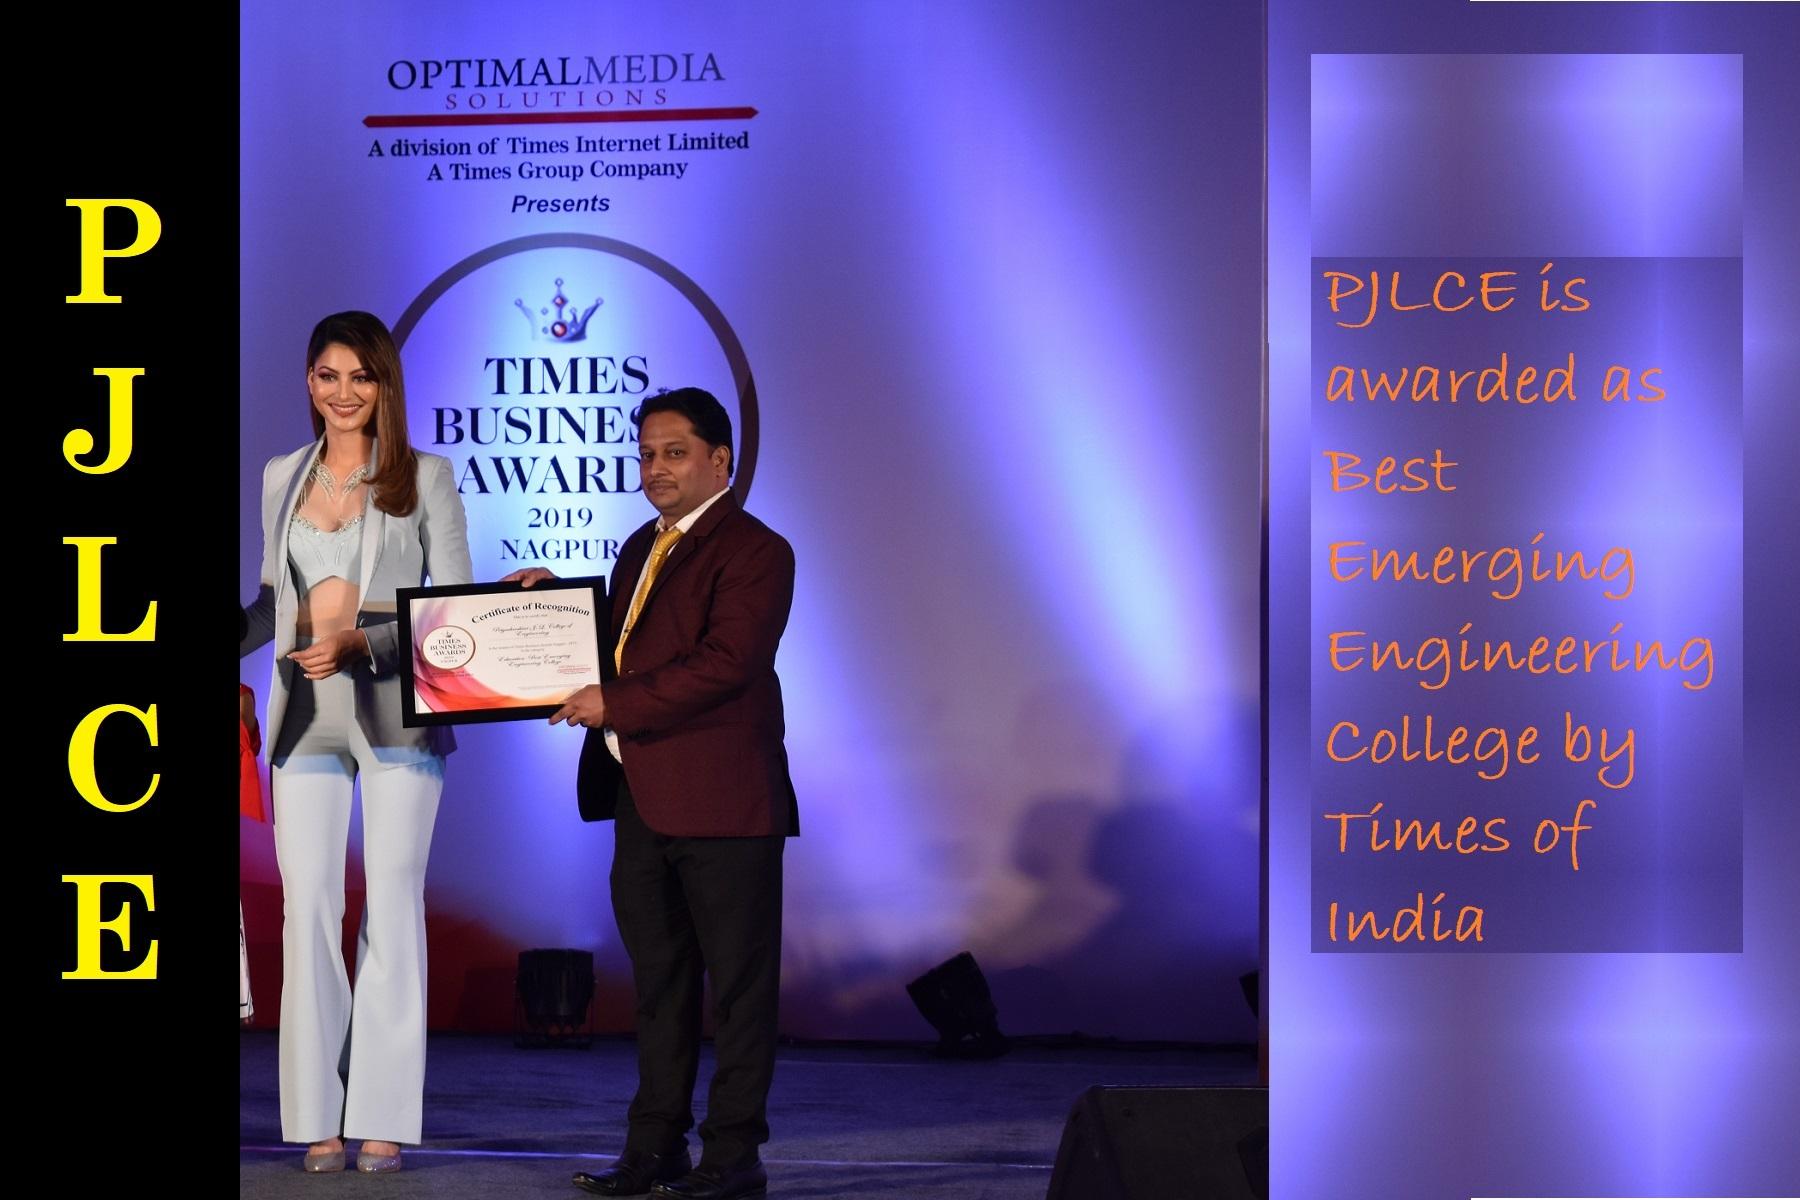 pjlce_times_award_2019